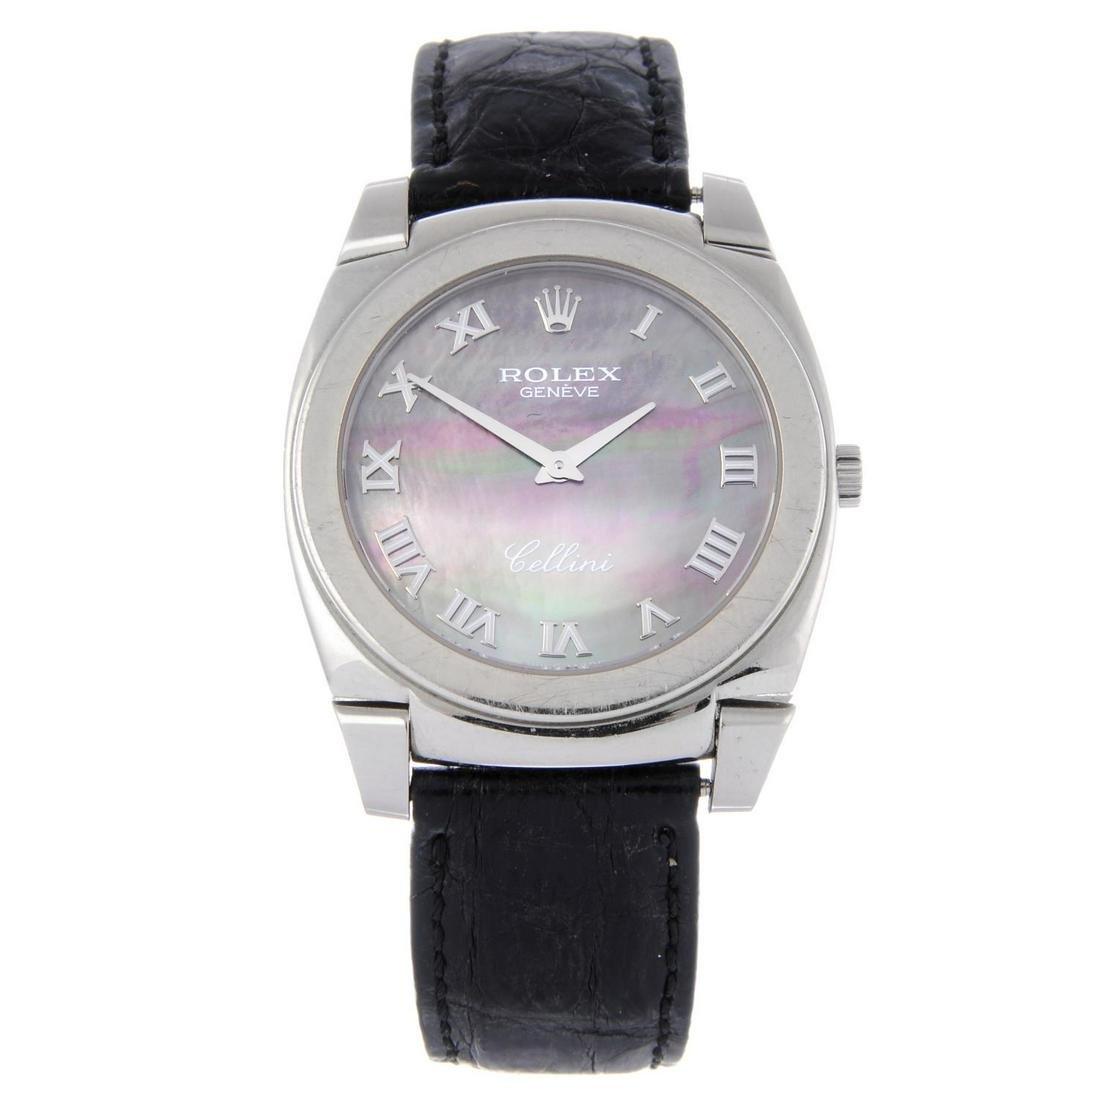 ROLEX - a gentleman's Cellini wrist watch. Circa 2001.